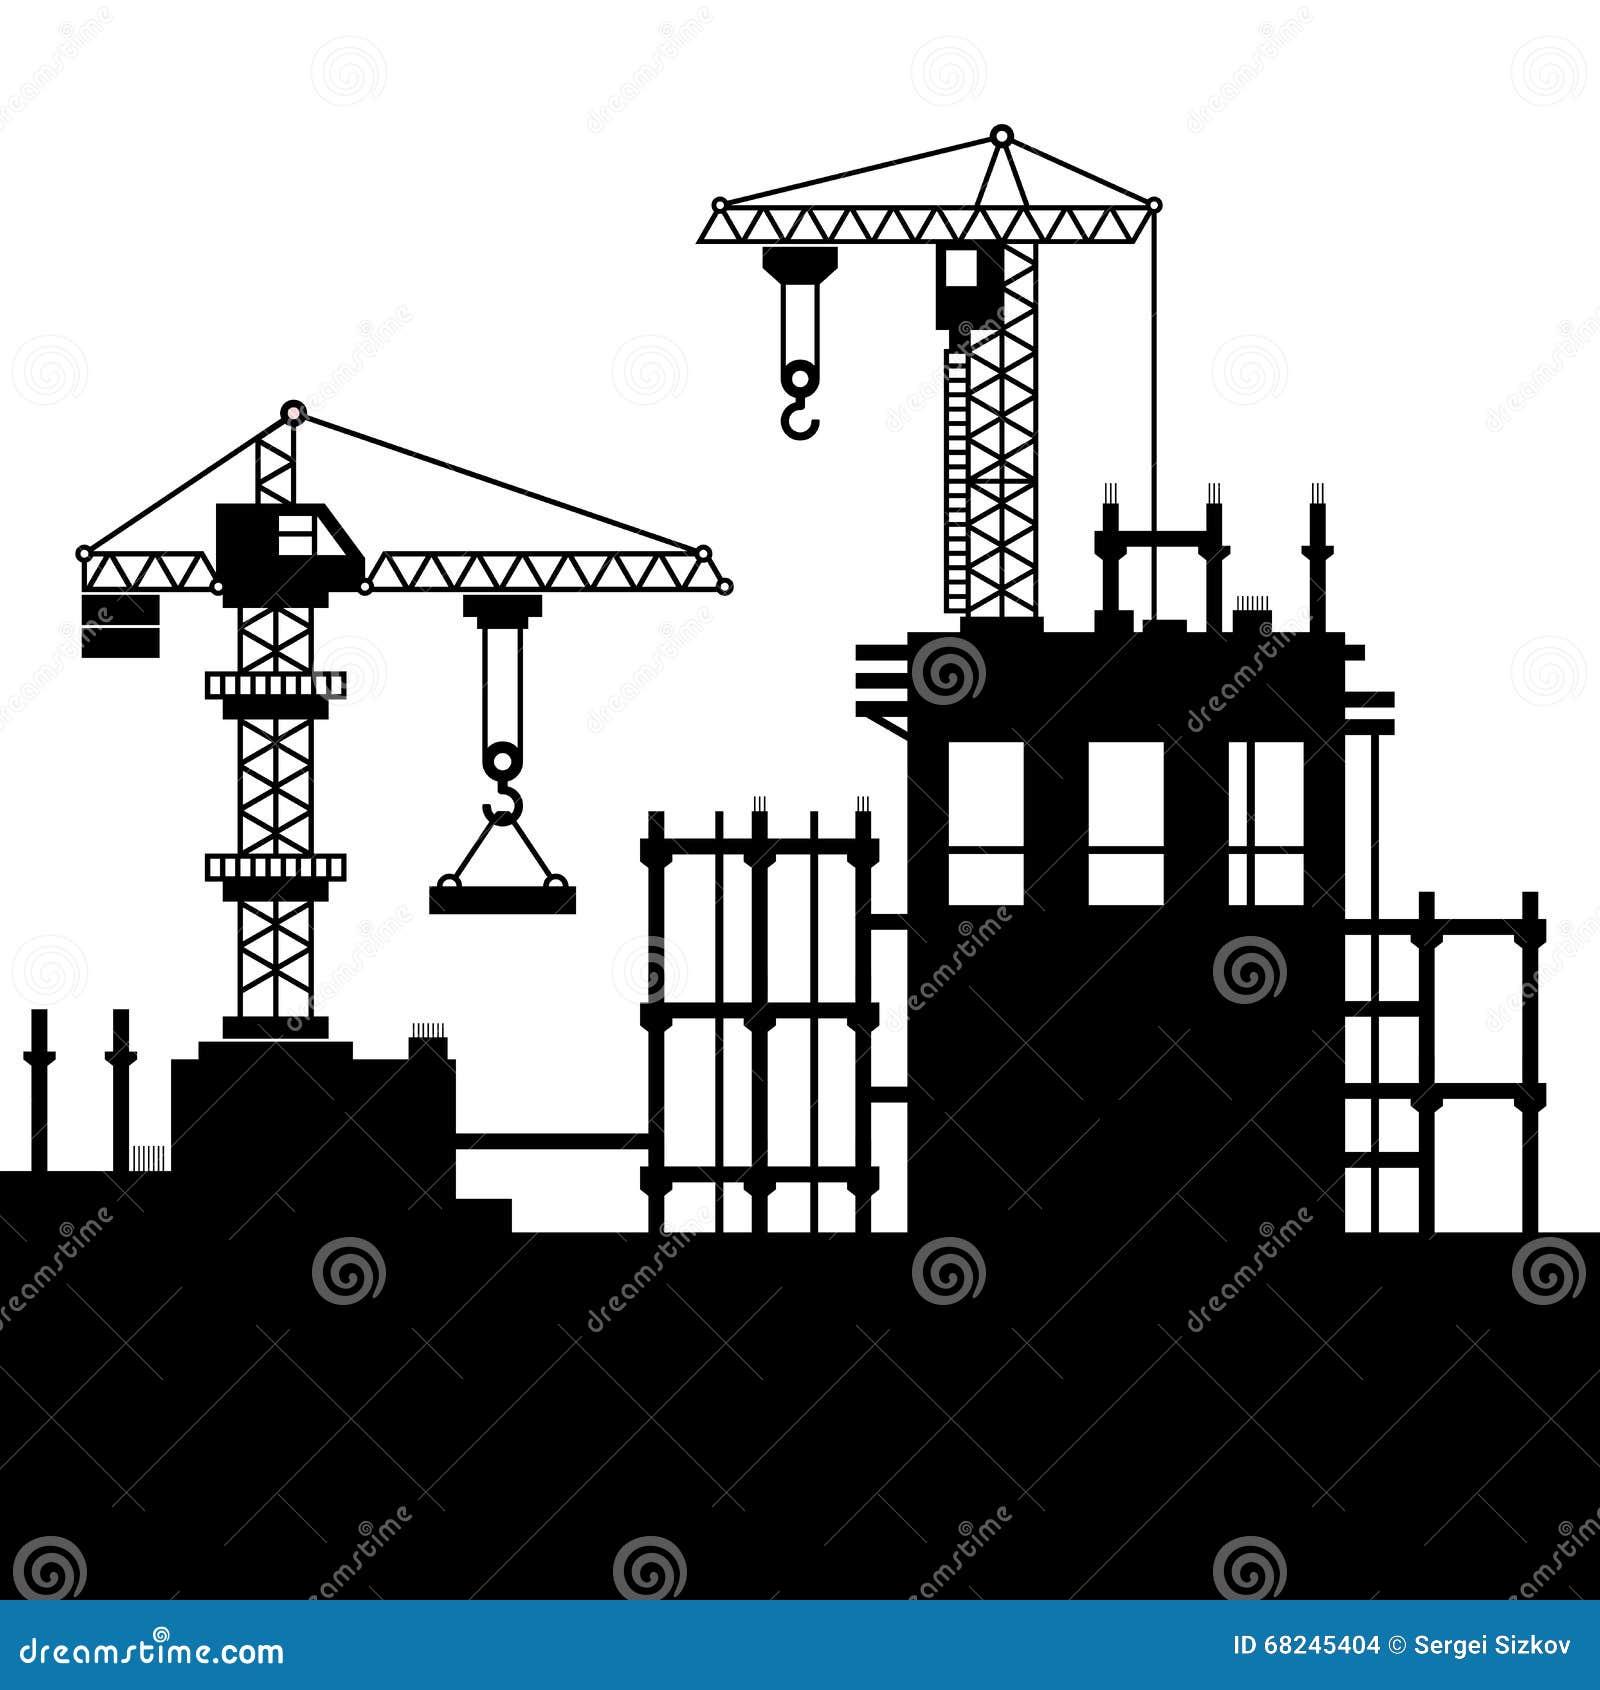 Baustelle Mit Turmkranen Vektor Vektor Abbildung - Bild: 68245404